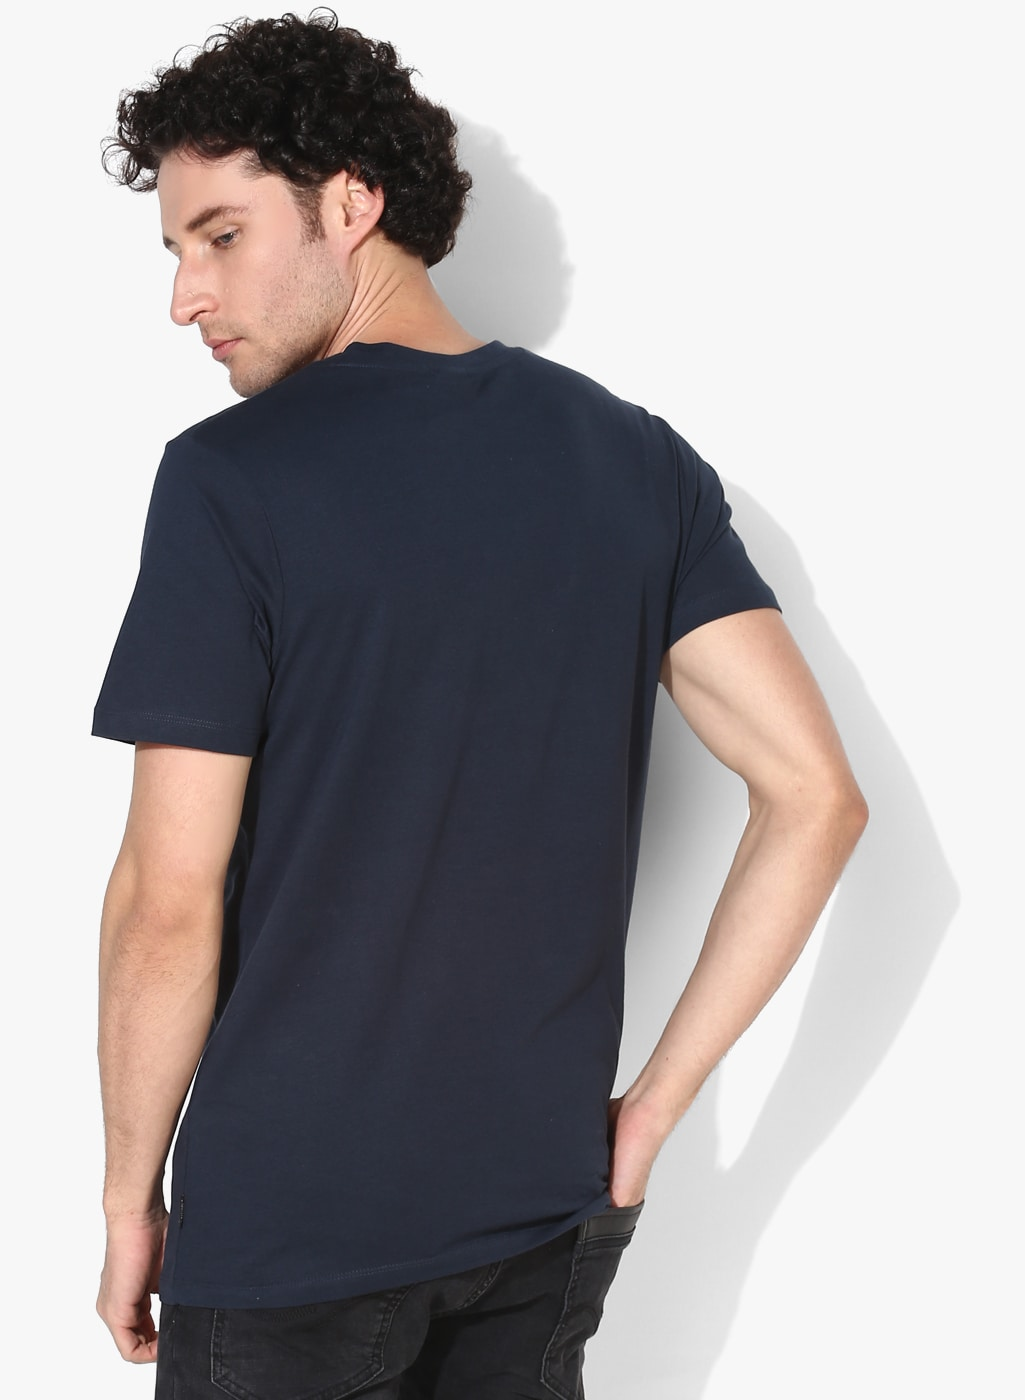 on sale d86ad b652e Wear your style: Jabong.com